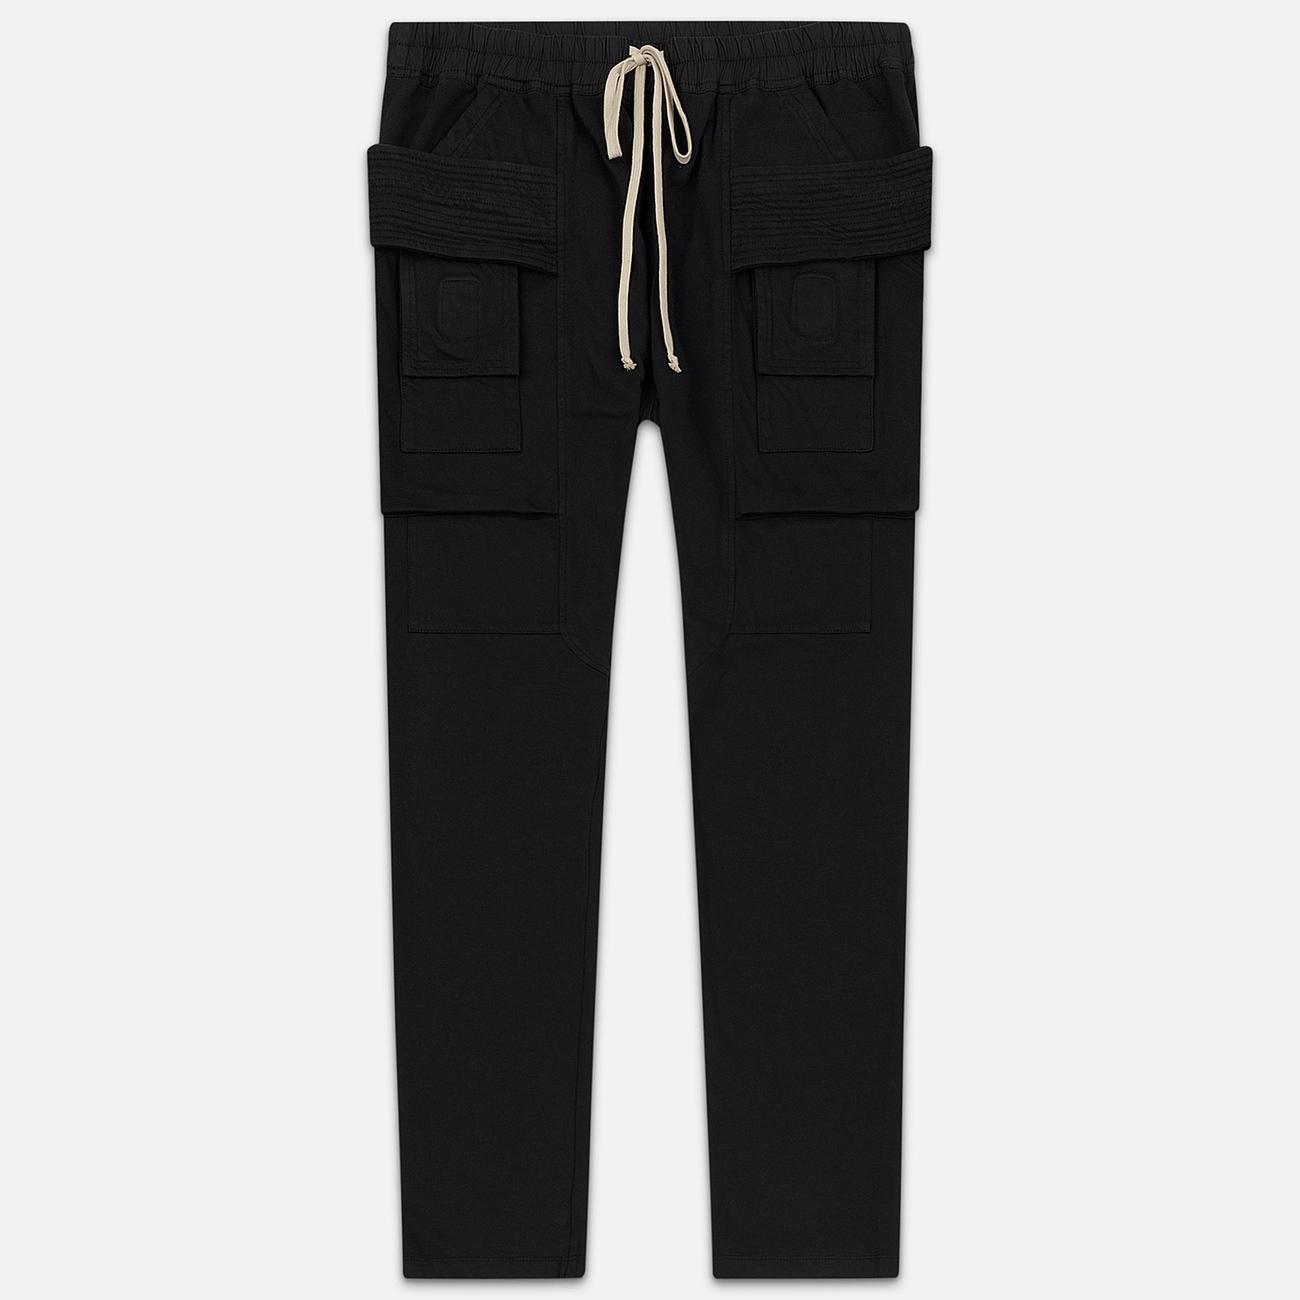 Мужские брюки Rick Owens DRKSHDW Creatch Cargo Loose Fit Black